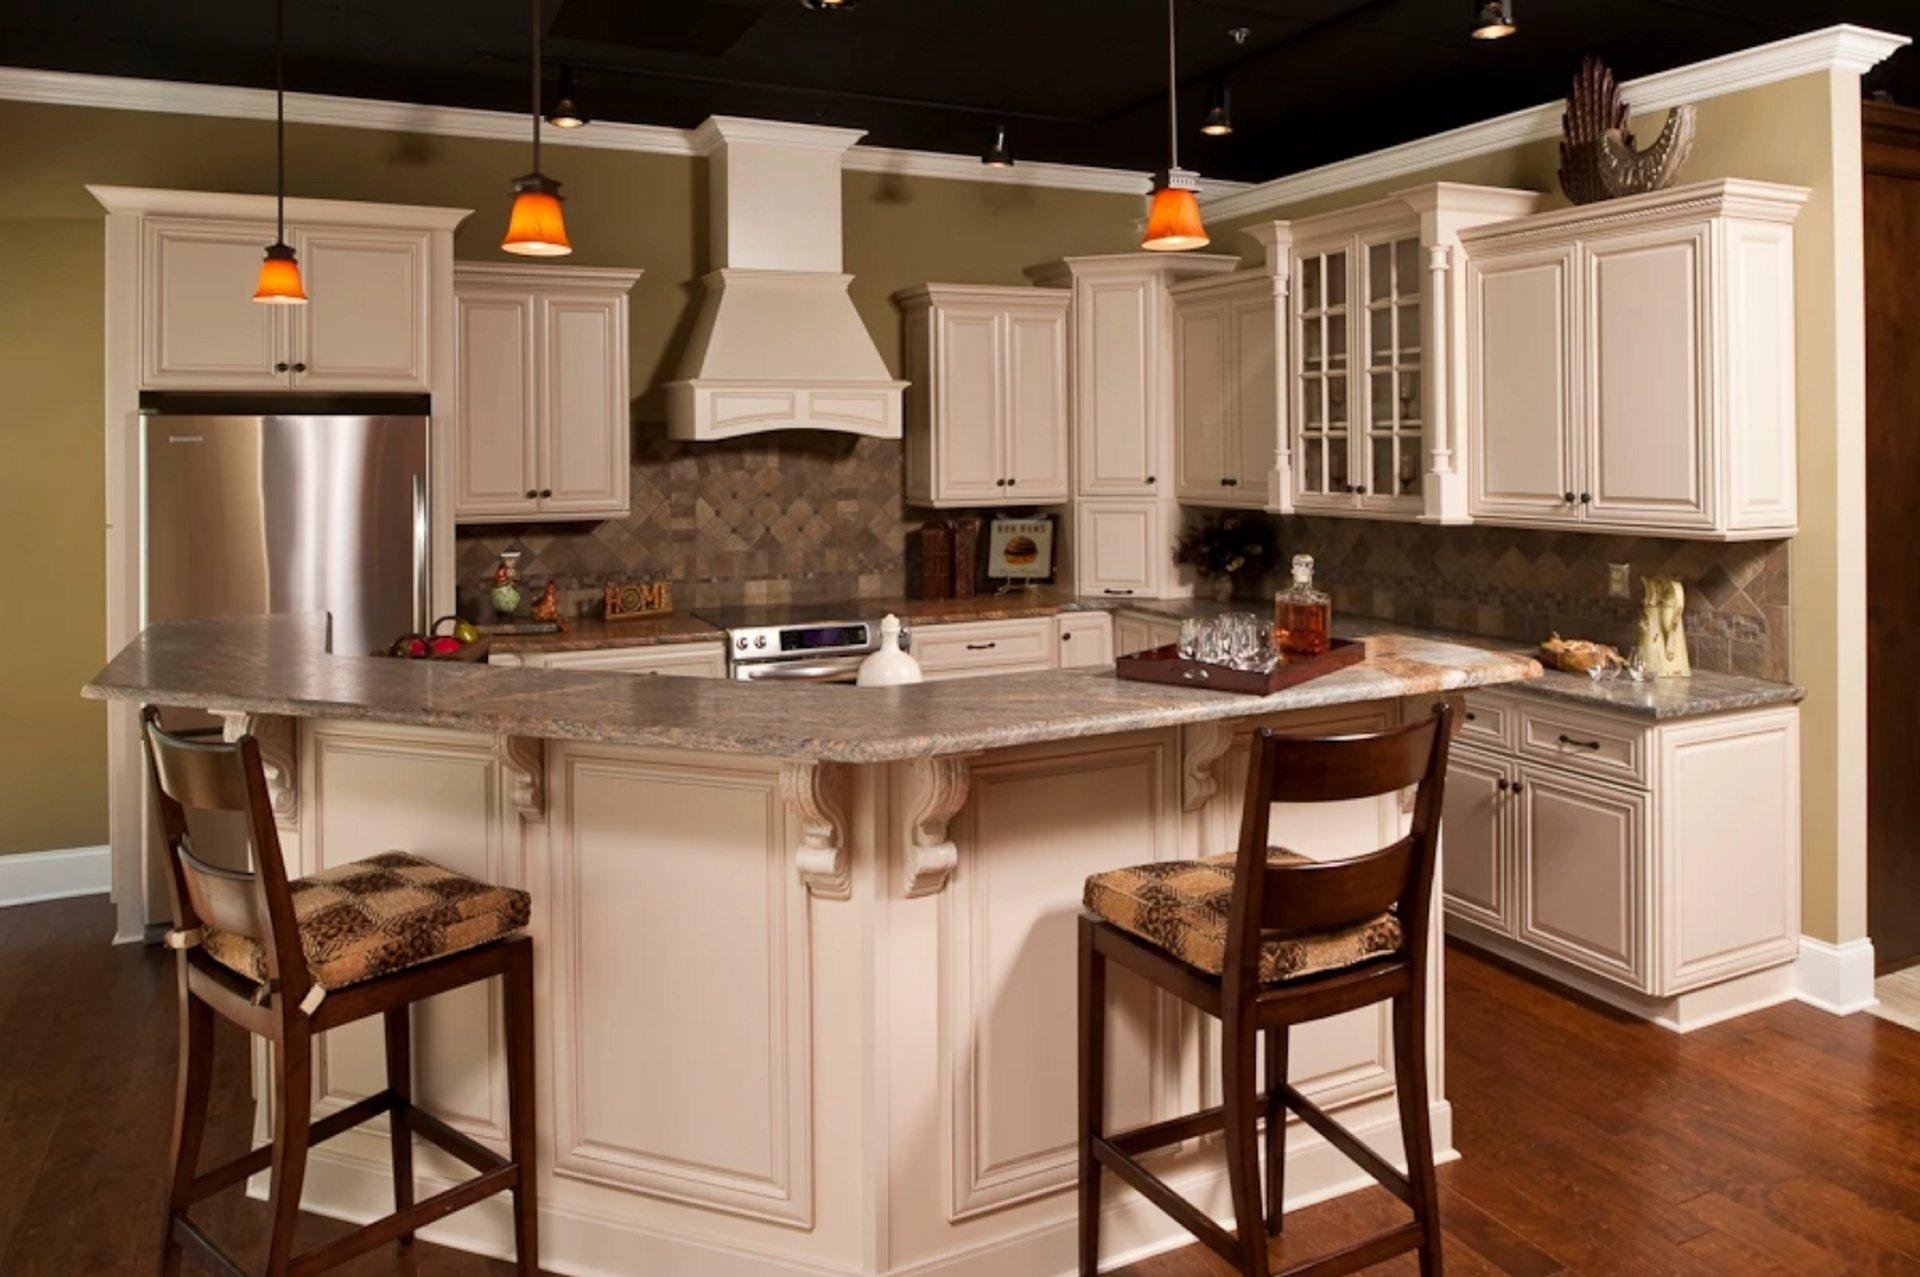 Cream Kitchen Cabinets with Mocha Glaze | RTA Kitchen ...